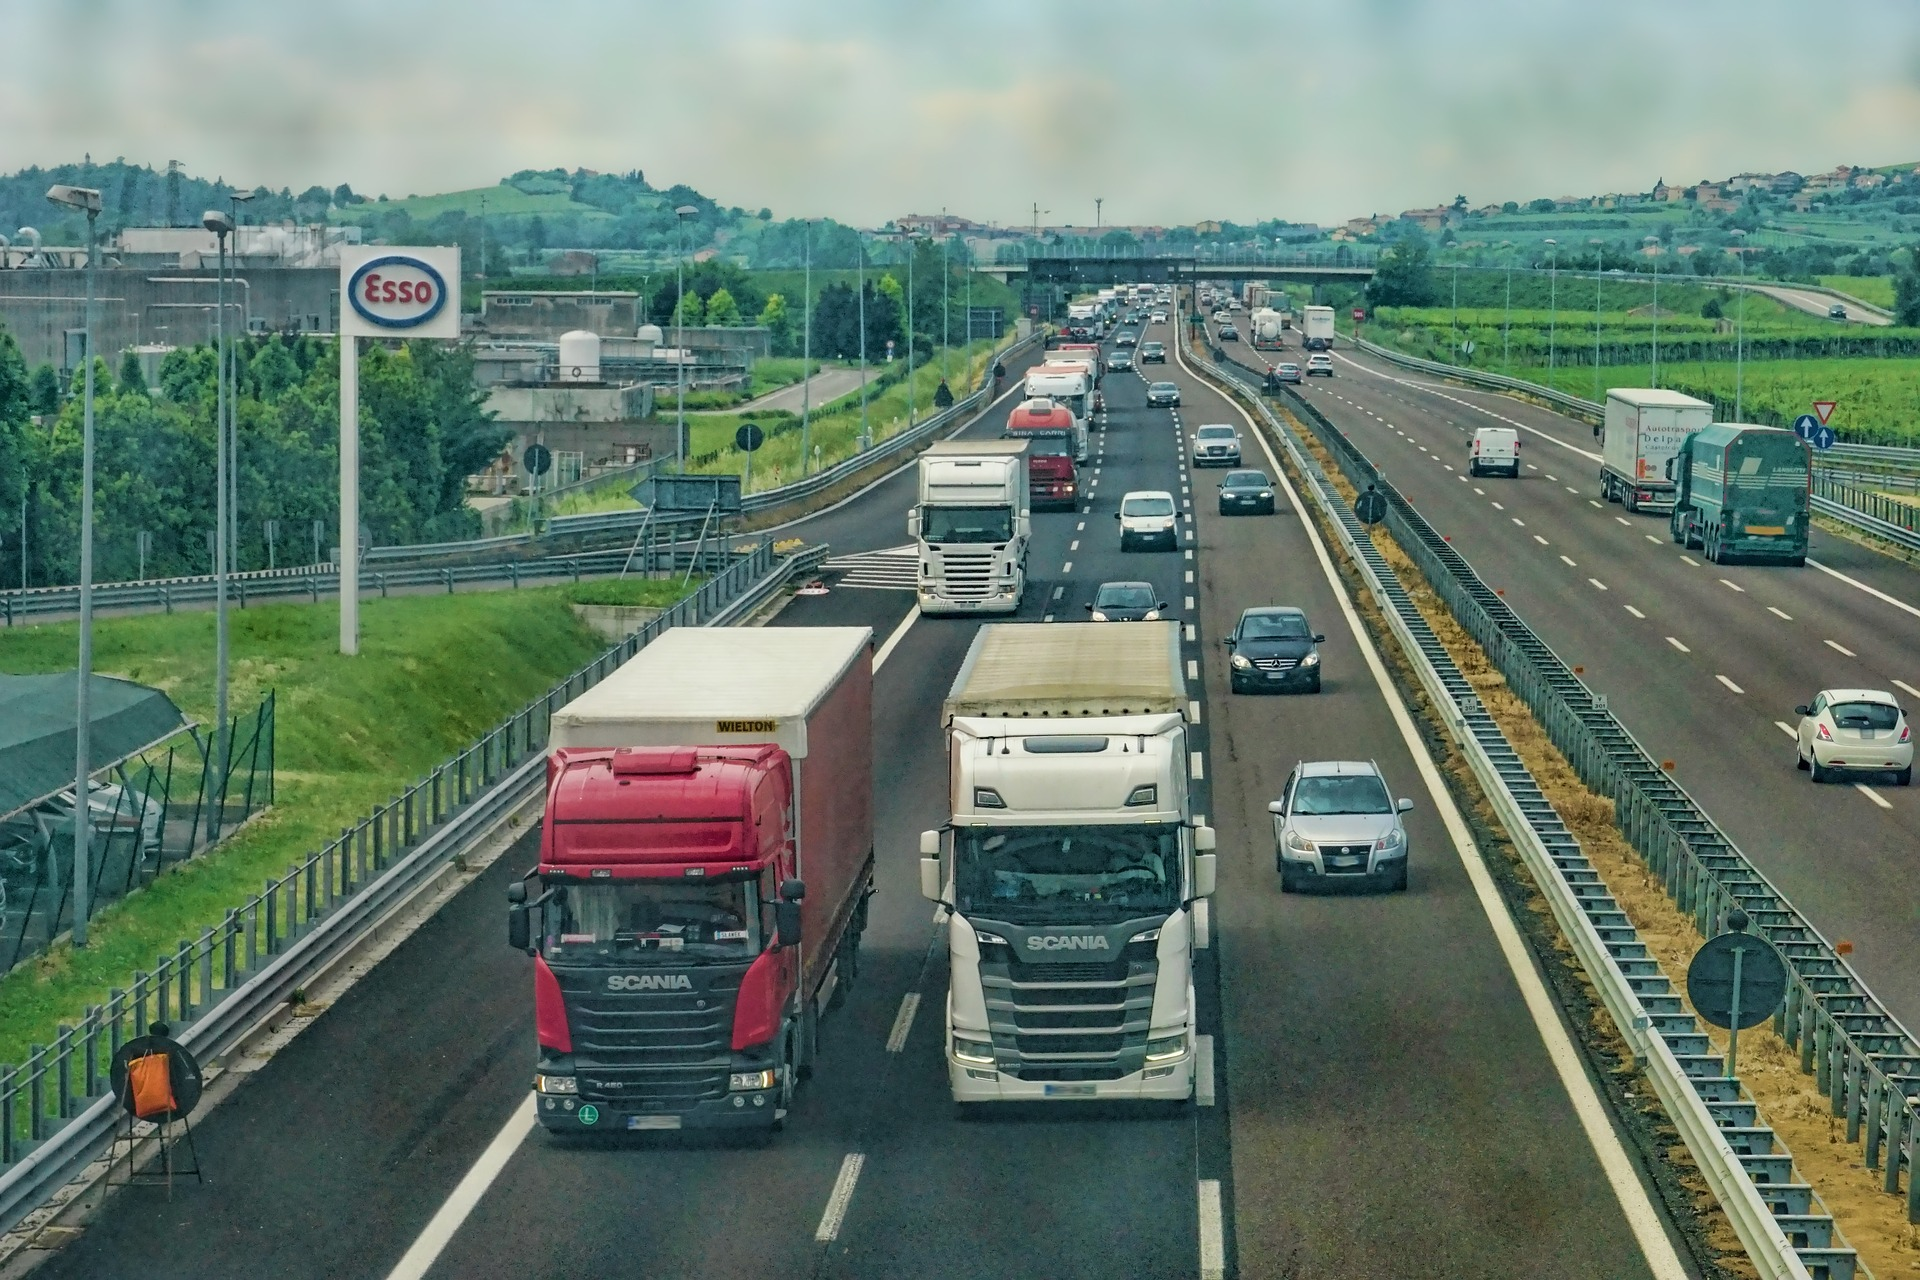 file/ELEMENTO_NEWSLETTER/20386/Autostrade_highway-3392100_1920.jpg